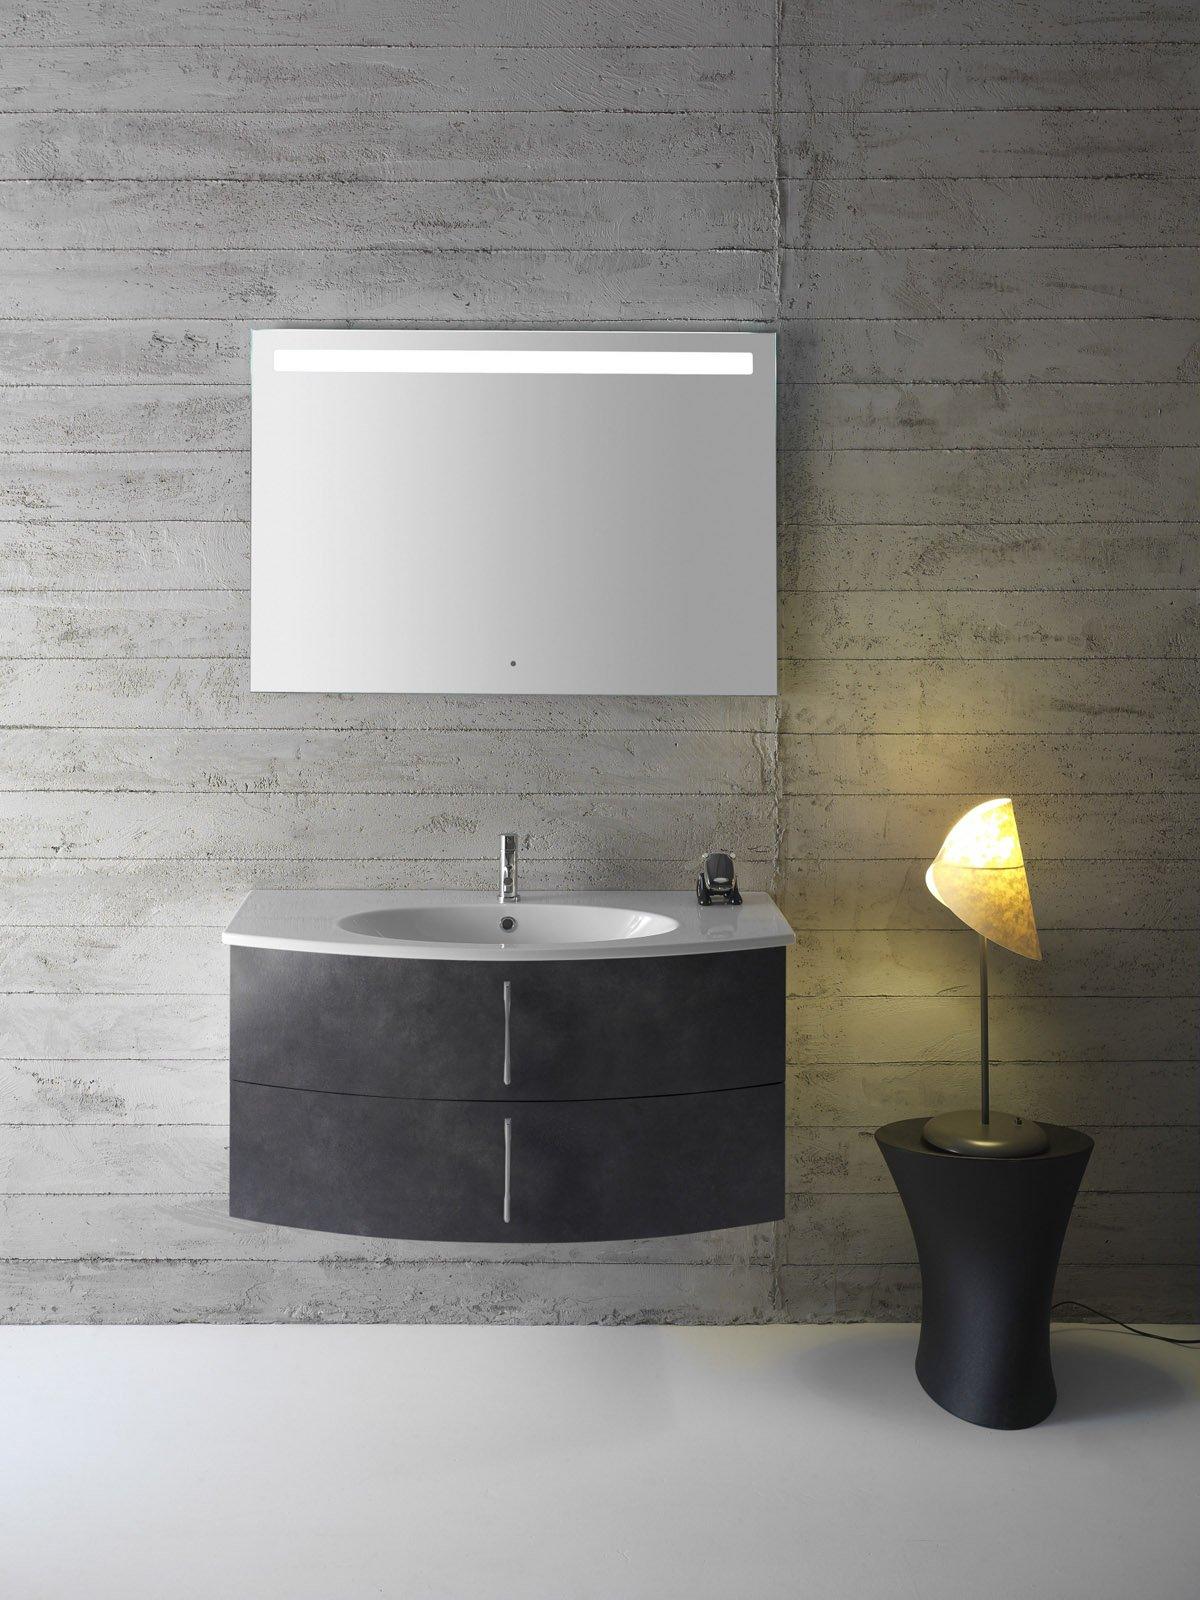 cersaie 2013: le proposte d'arredo bagno - cose di casa - Proposte Di Arredo Bagno